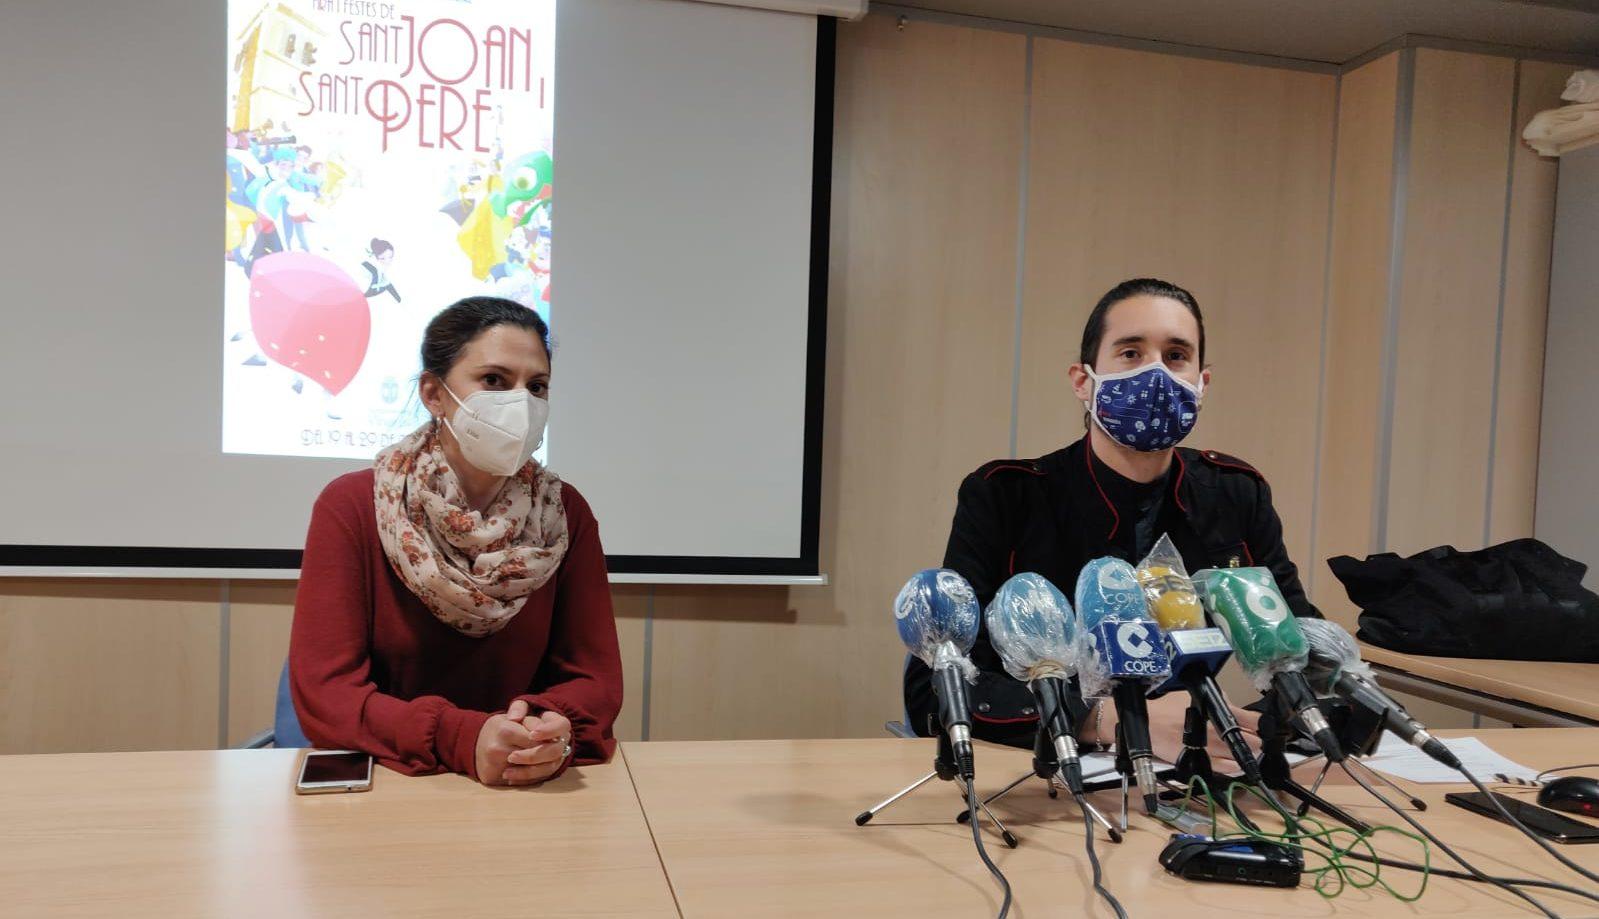 Vinaròs treballa per celebrar les Festes de Sant Joan i Sant Pere